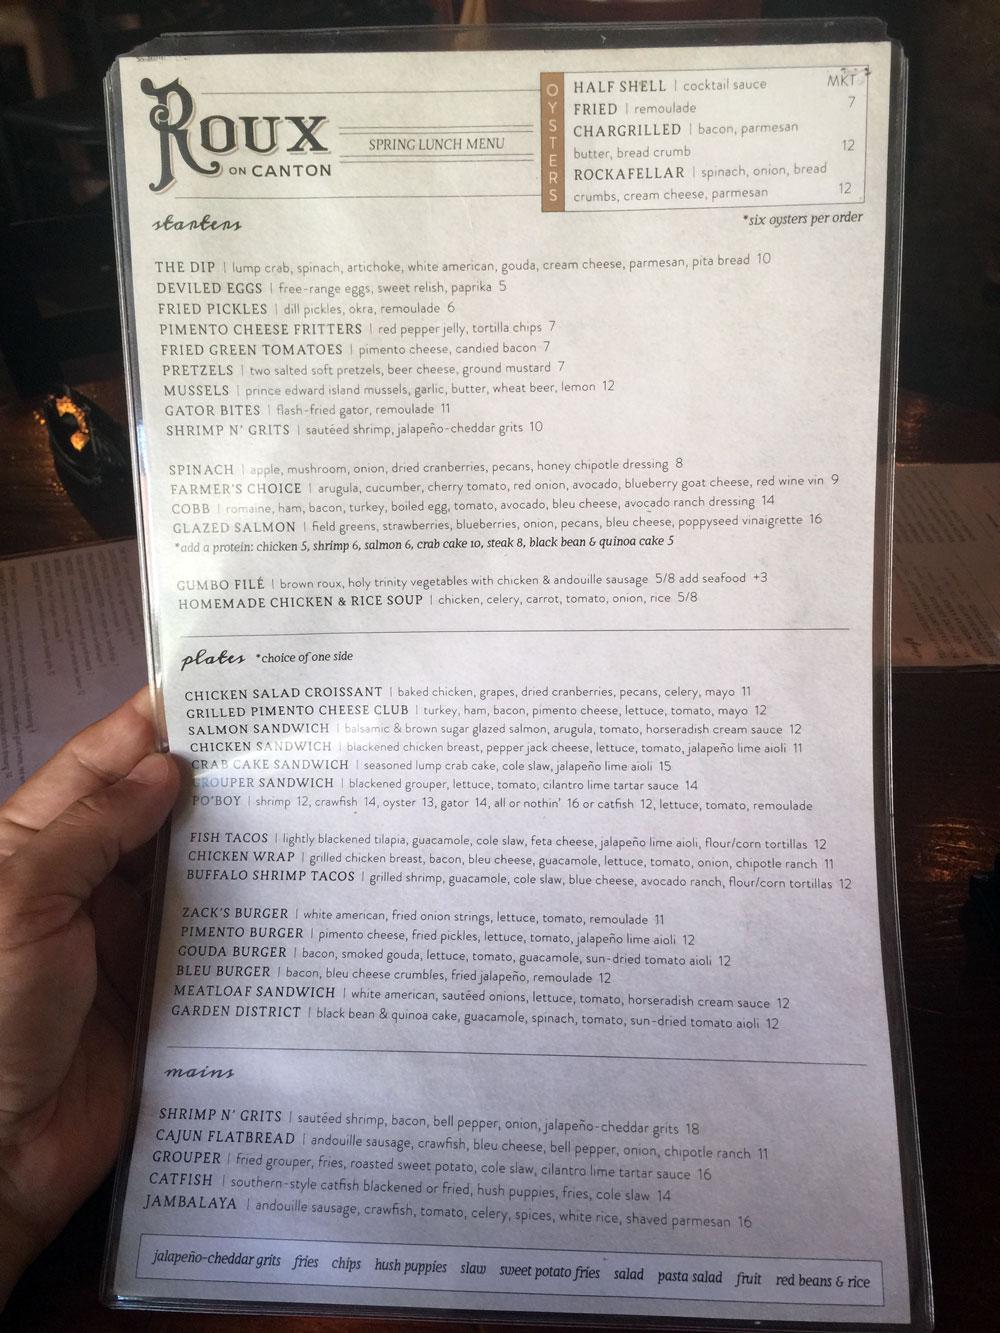 Independent Restaurant Review: September 2015